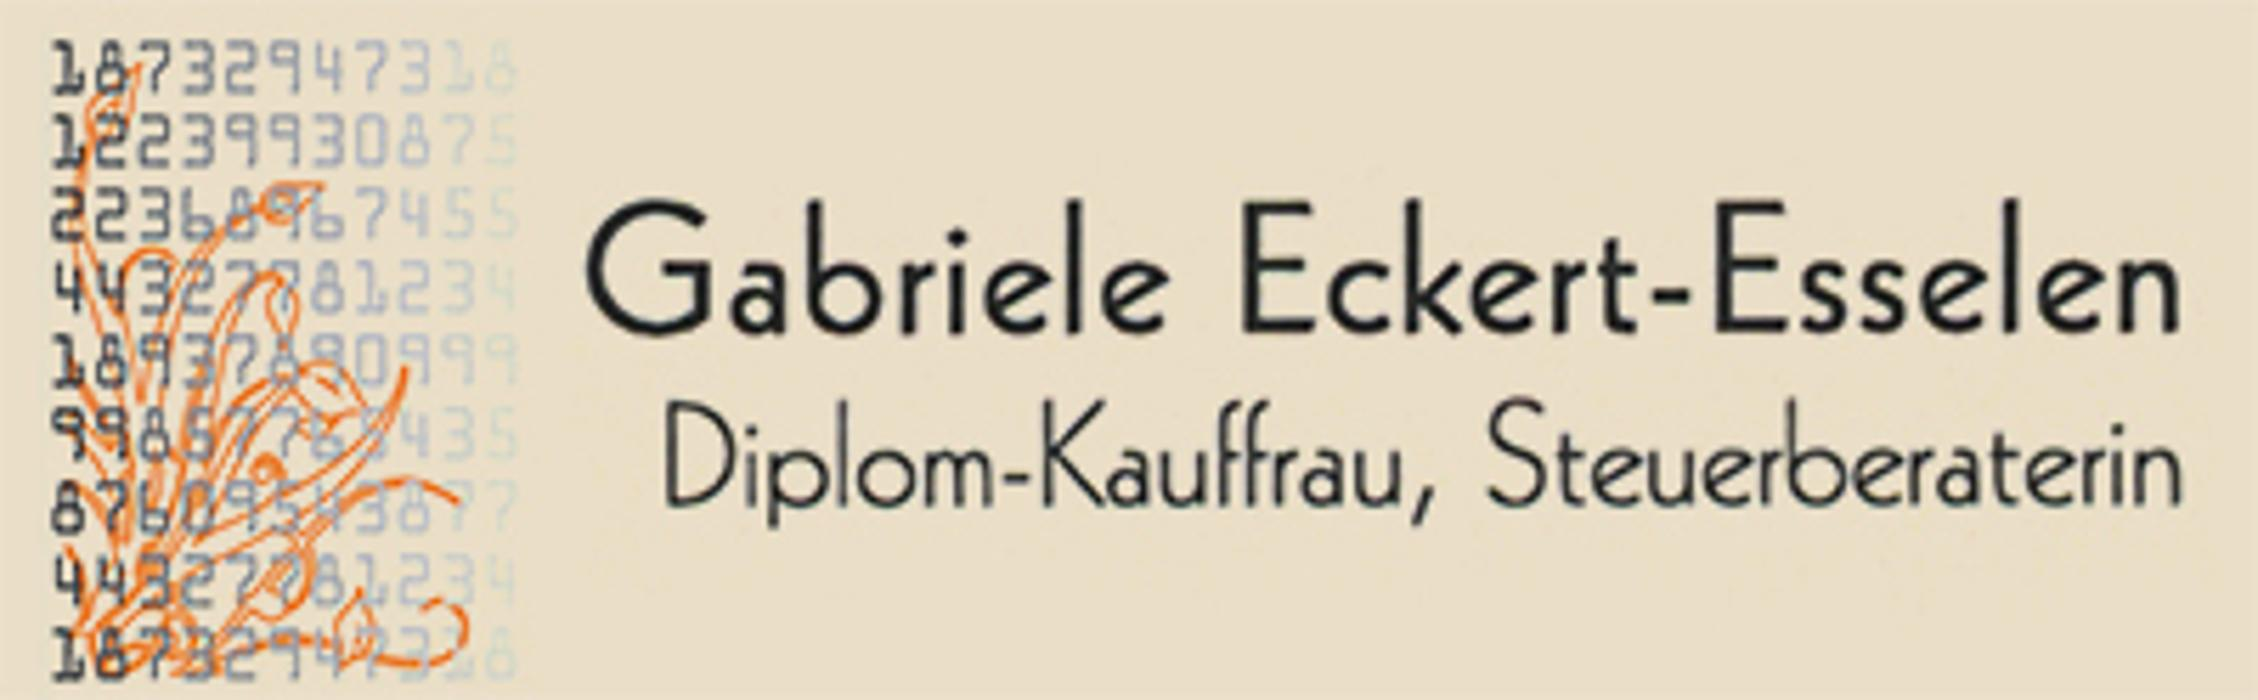 Bild zu Dipl.-Kffr. Gabriele Eckert-Esselen Steuerberaterin in Karlsruhe